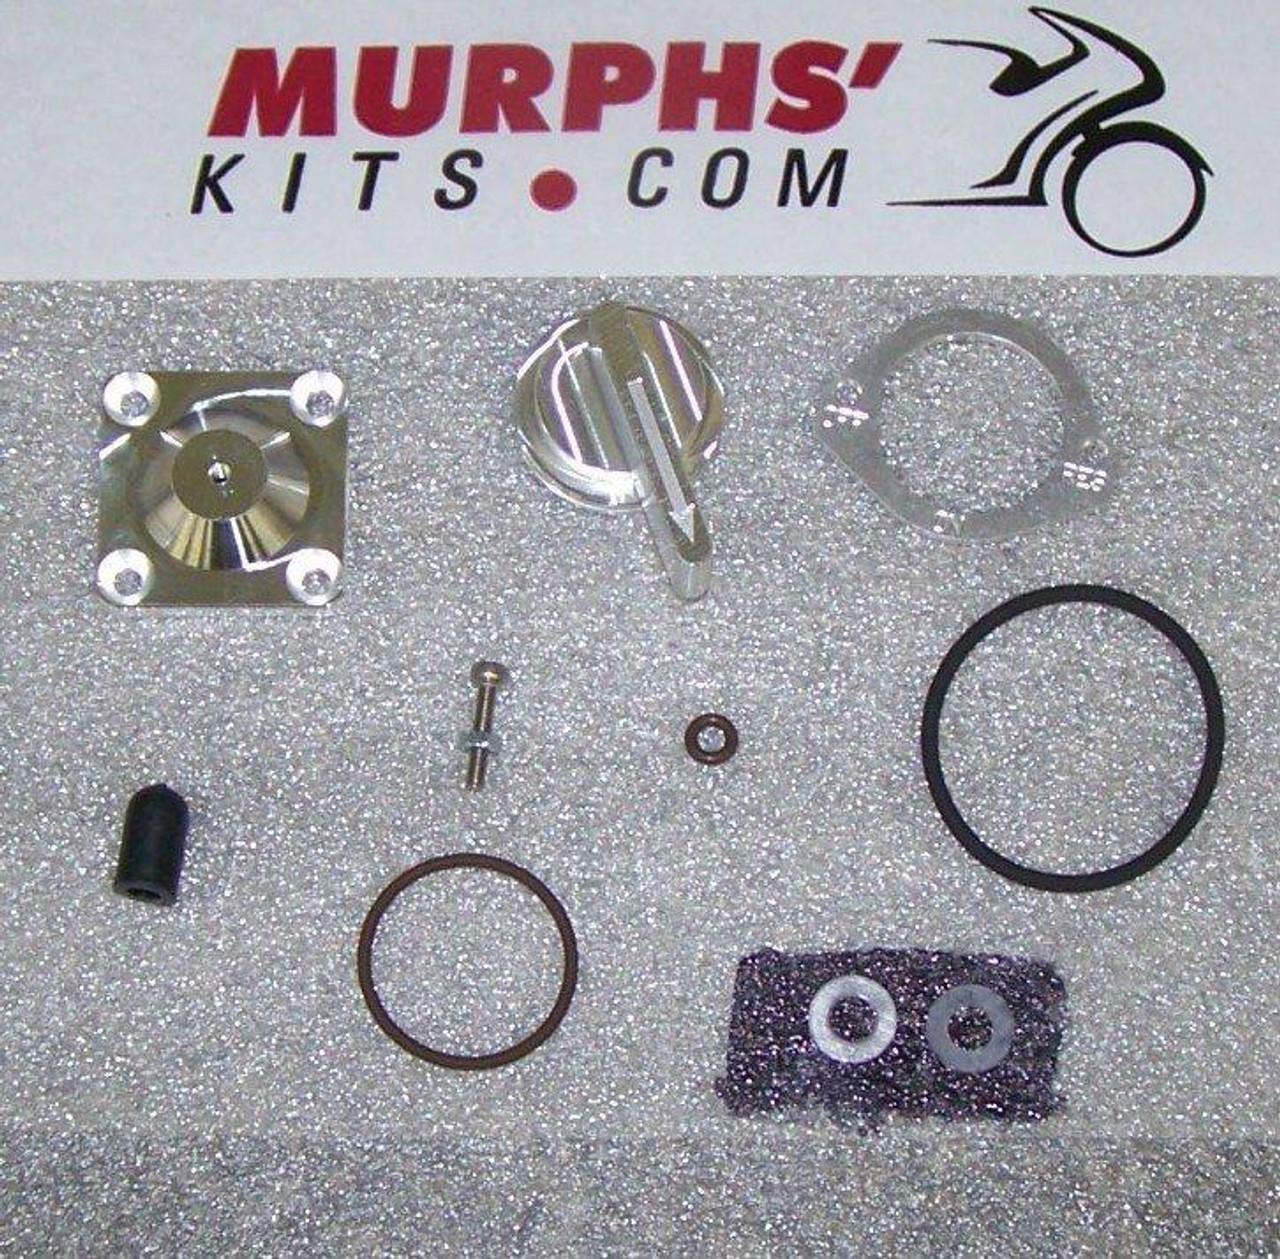 Concours Manual Petcock Conversion Kit from Murph!